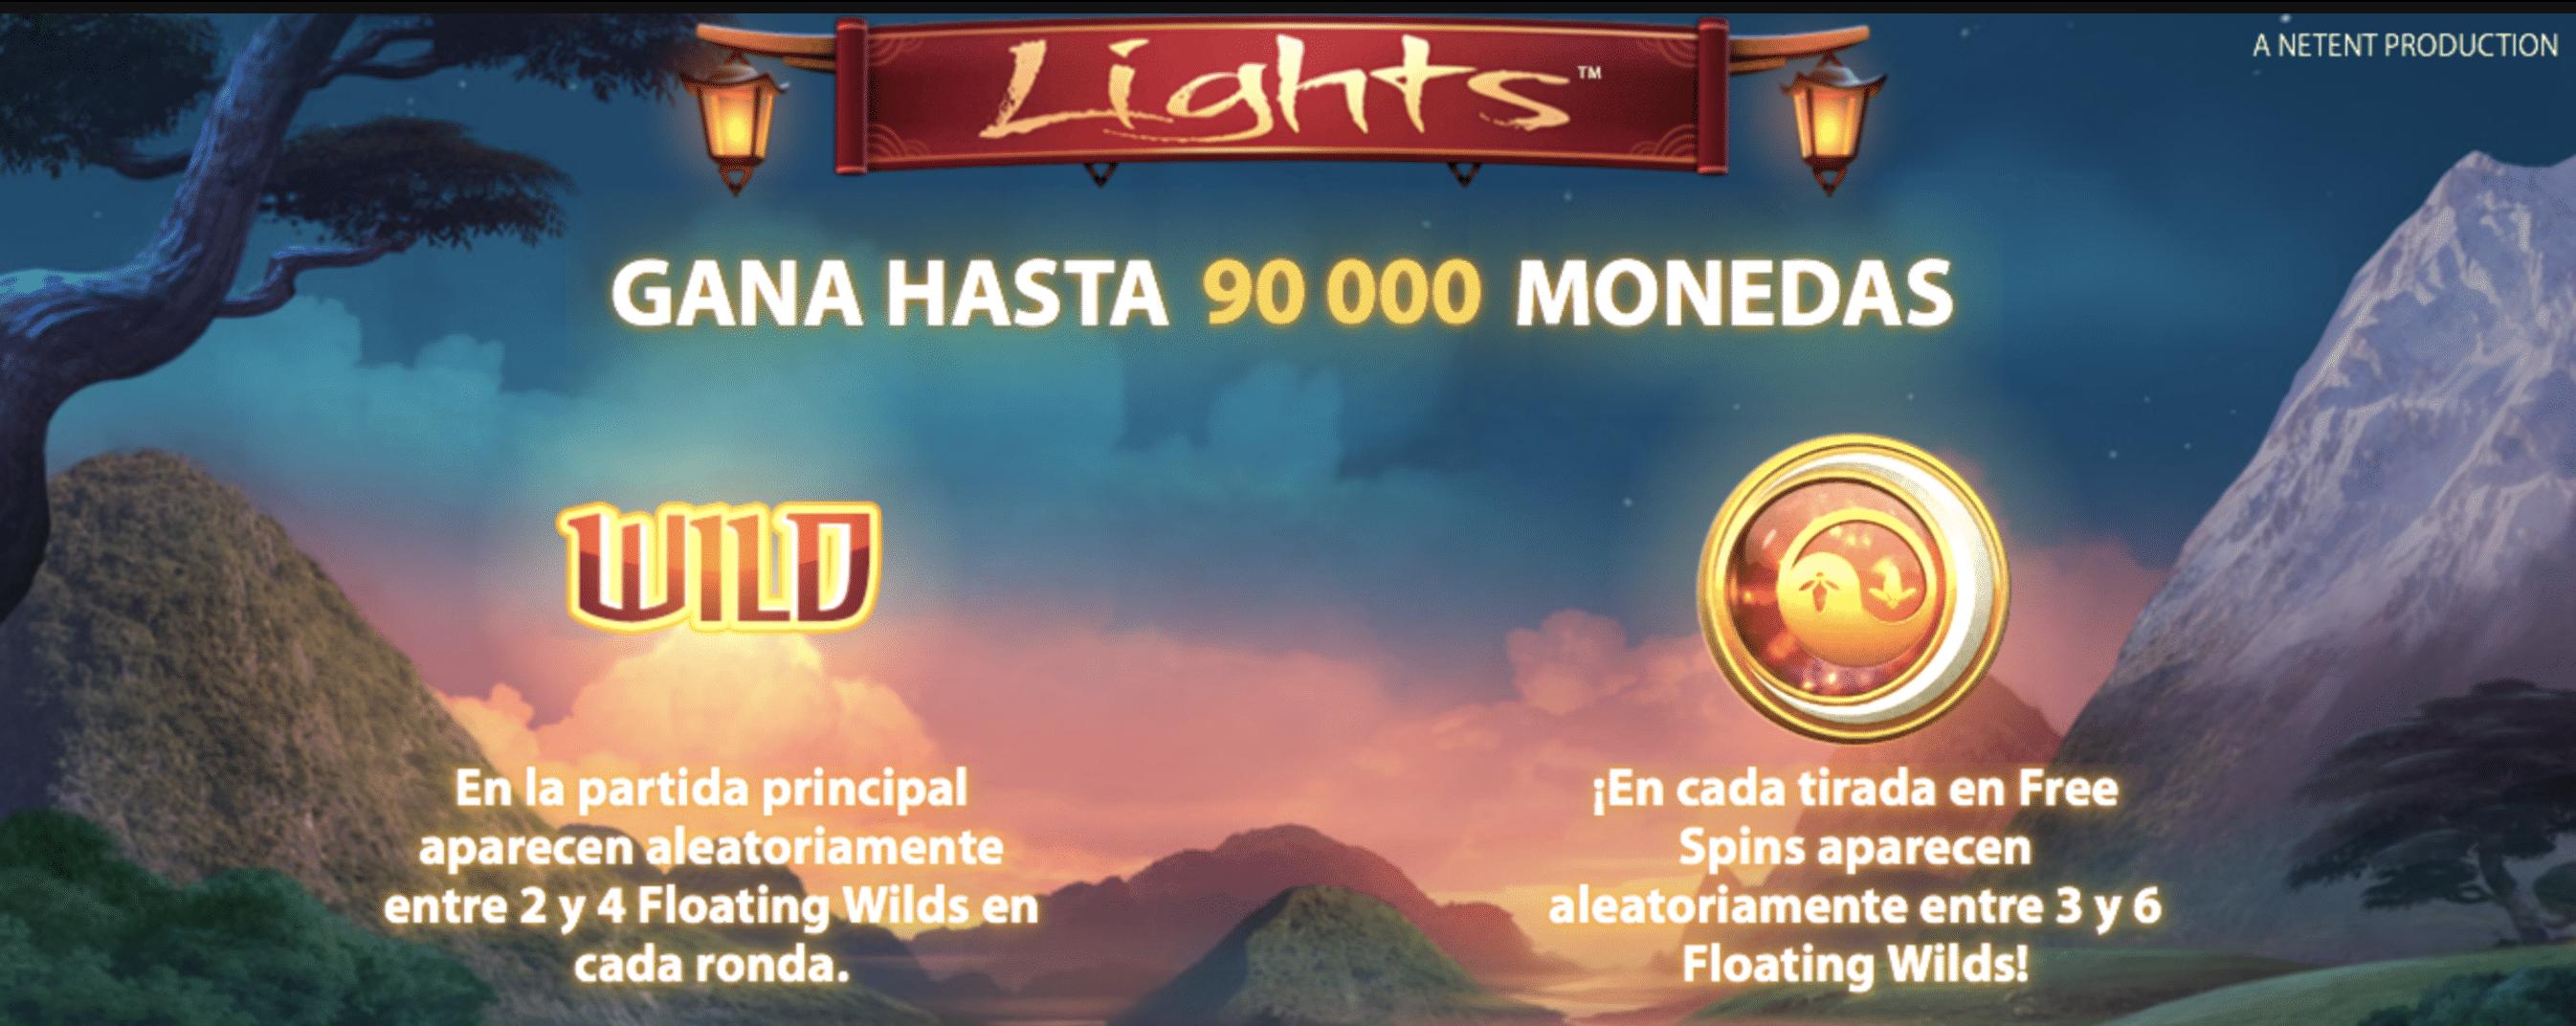 Ruleta para ganar celulares giros gratis casino Tenerife-229188